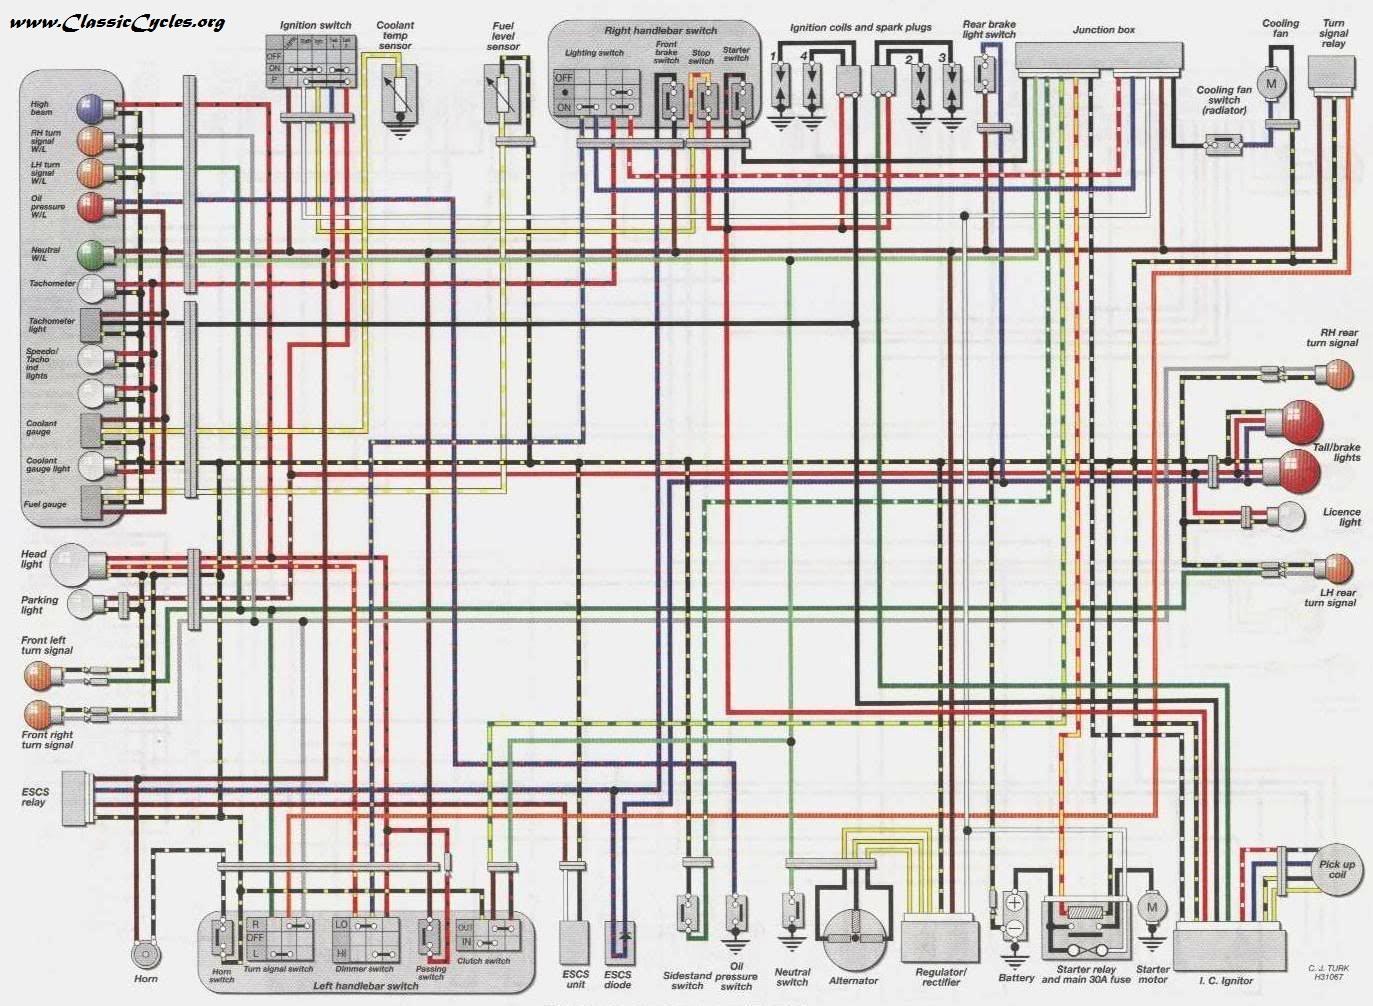 Pleasing Kawasaki Zephyr 750 Wiring Diagram Wiring Diagrams Lol Wiring Cloud Onicaalyptbenolwigegmohammedshrineorg